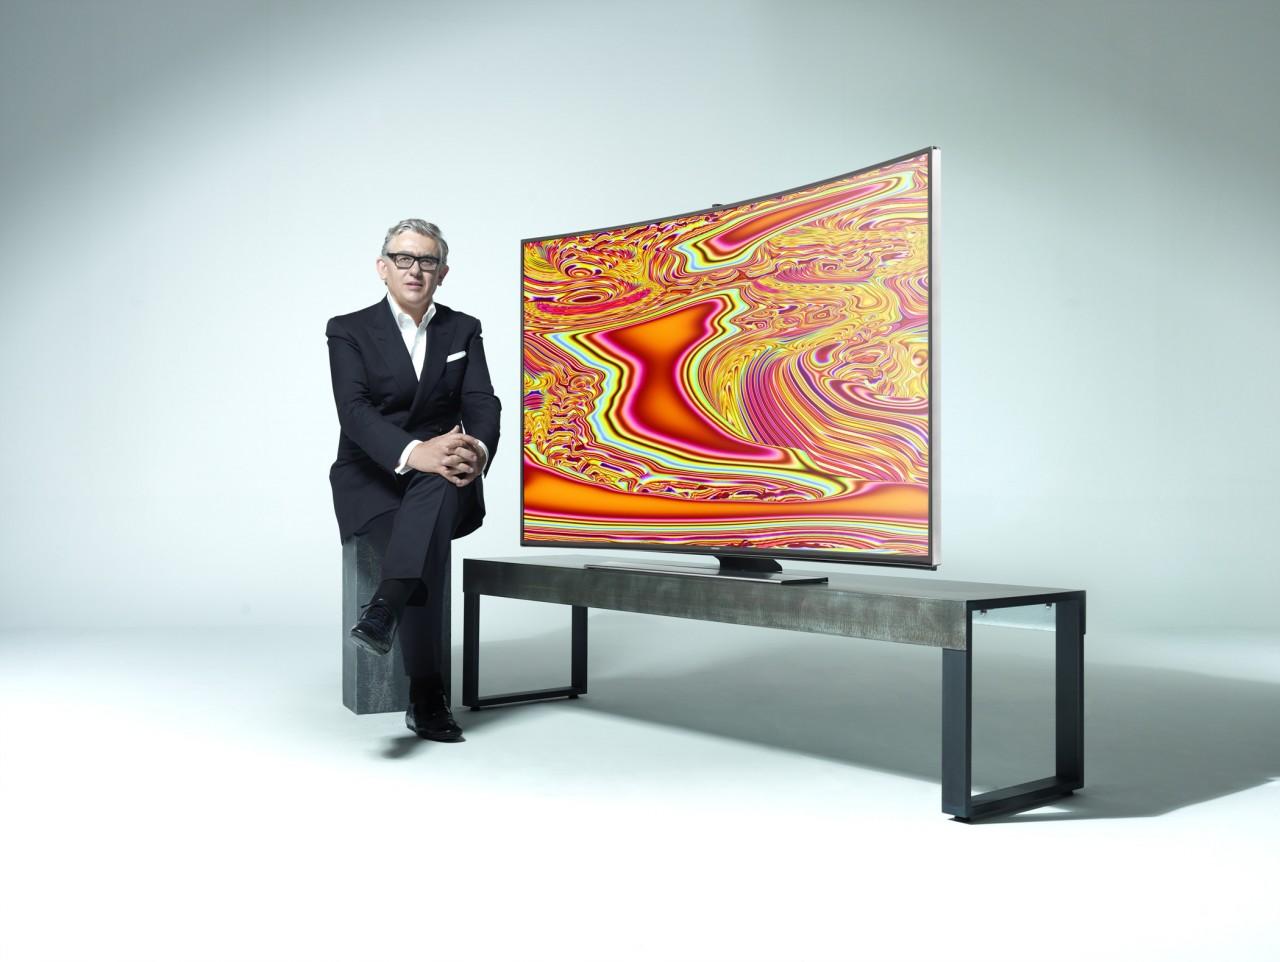 iFA 2014 – η εξέλιξη της τηλεόρασης είναι 4Κ, OLED, flexible και σε τεράστια μεγέθη…